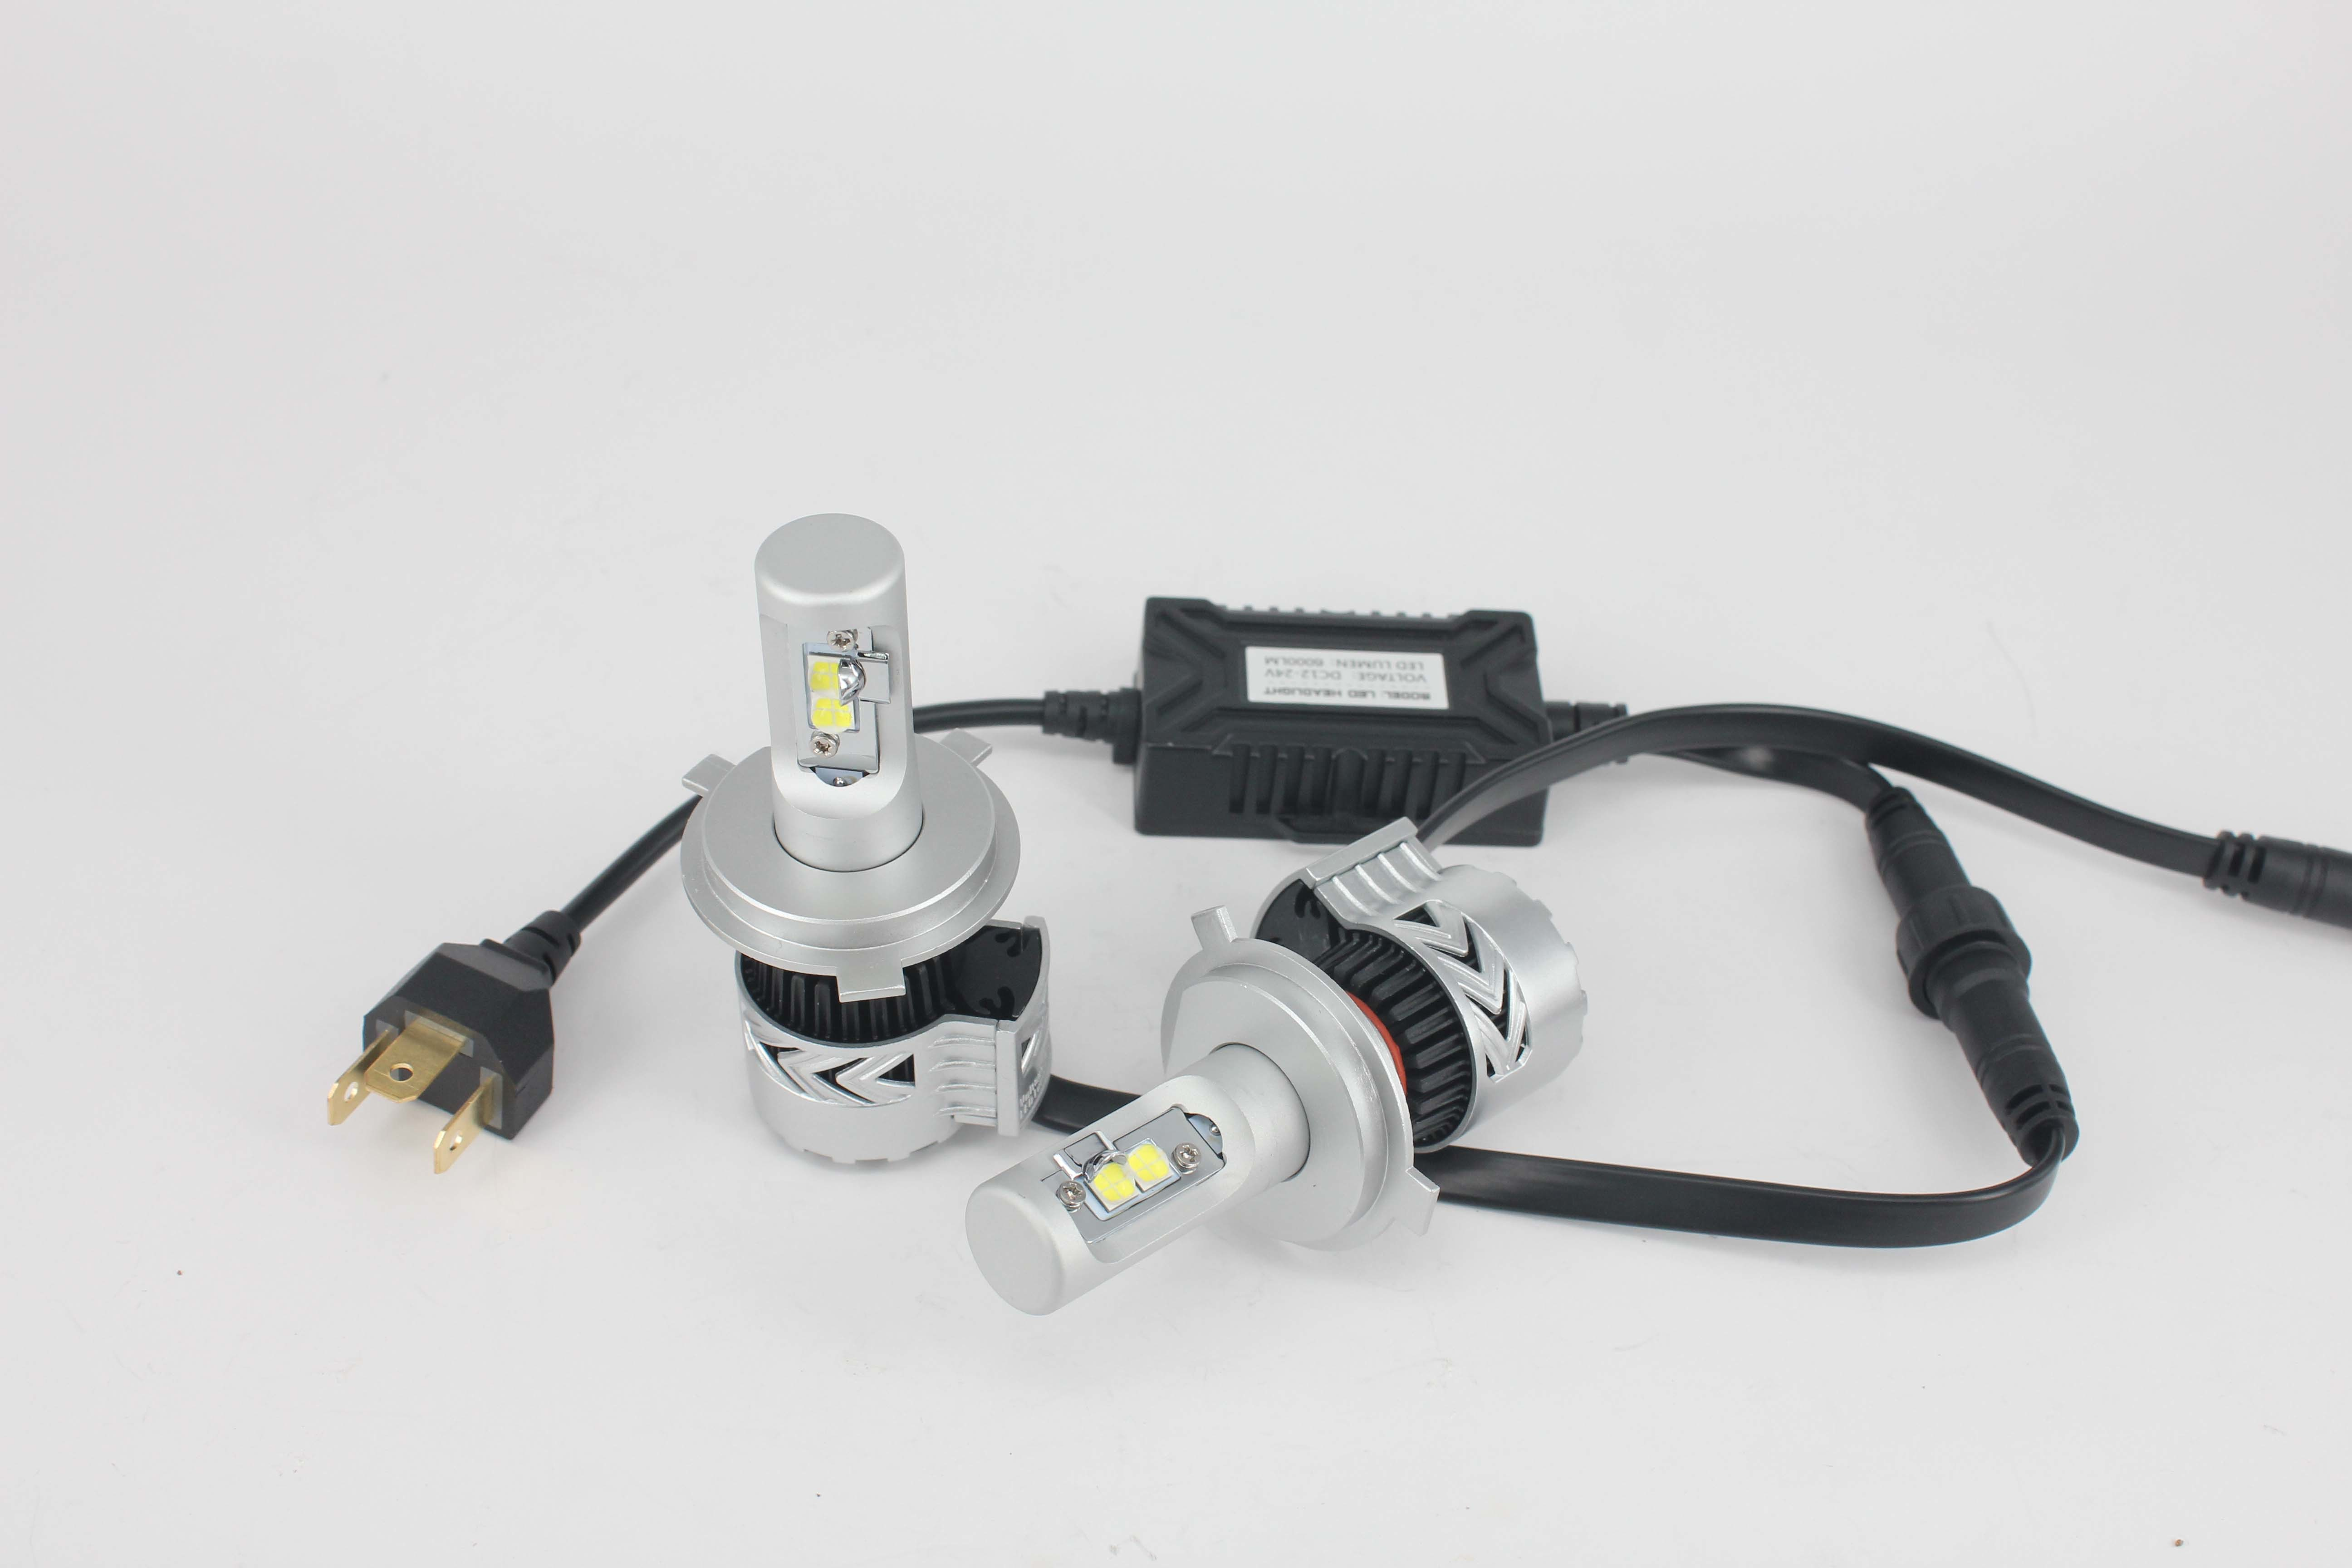 Markcars Fan T8 Car LED Light Auto Parts Headlight Bulb